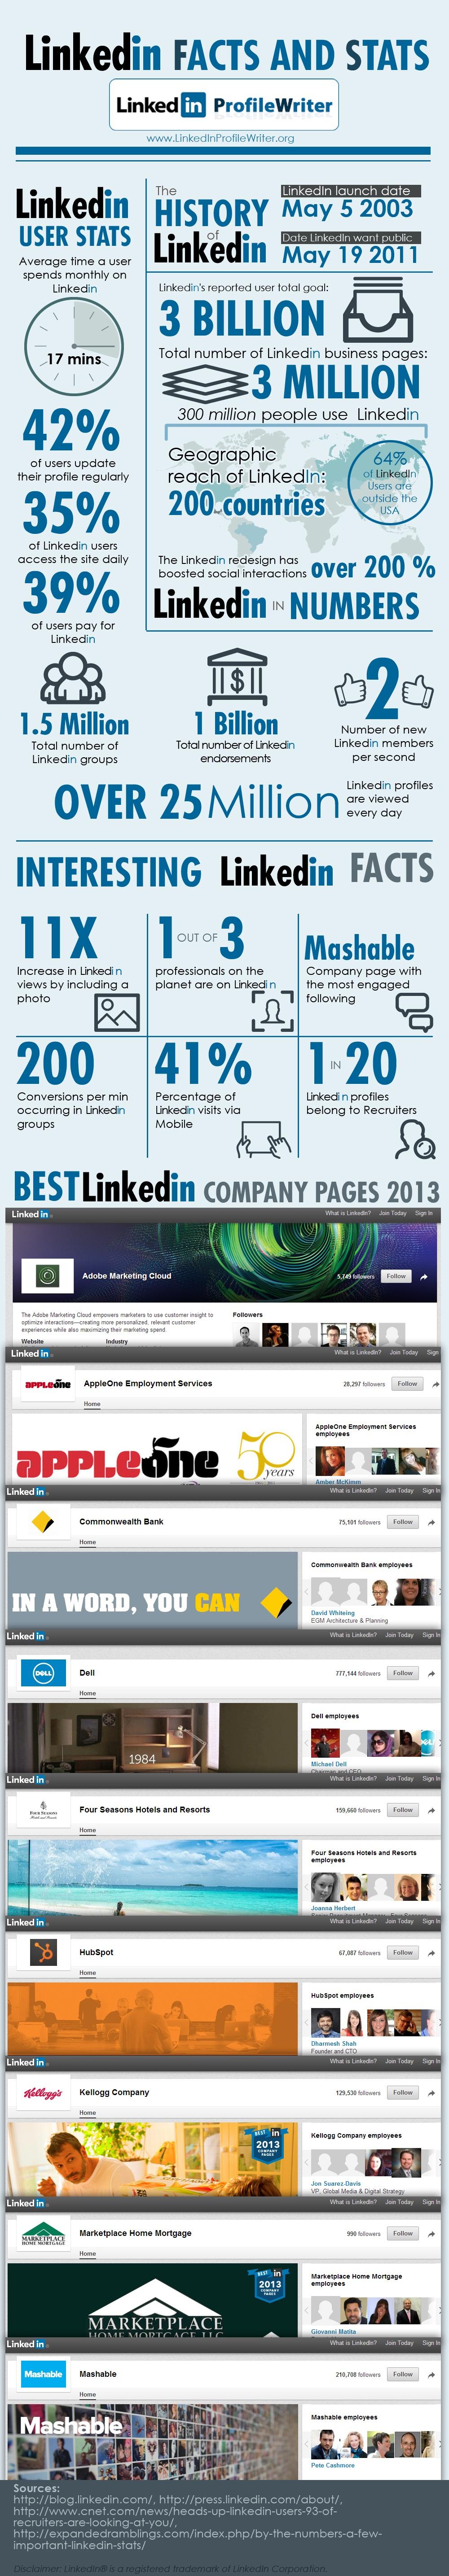 LinkedIn Facts and statistics